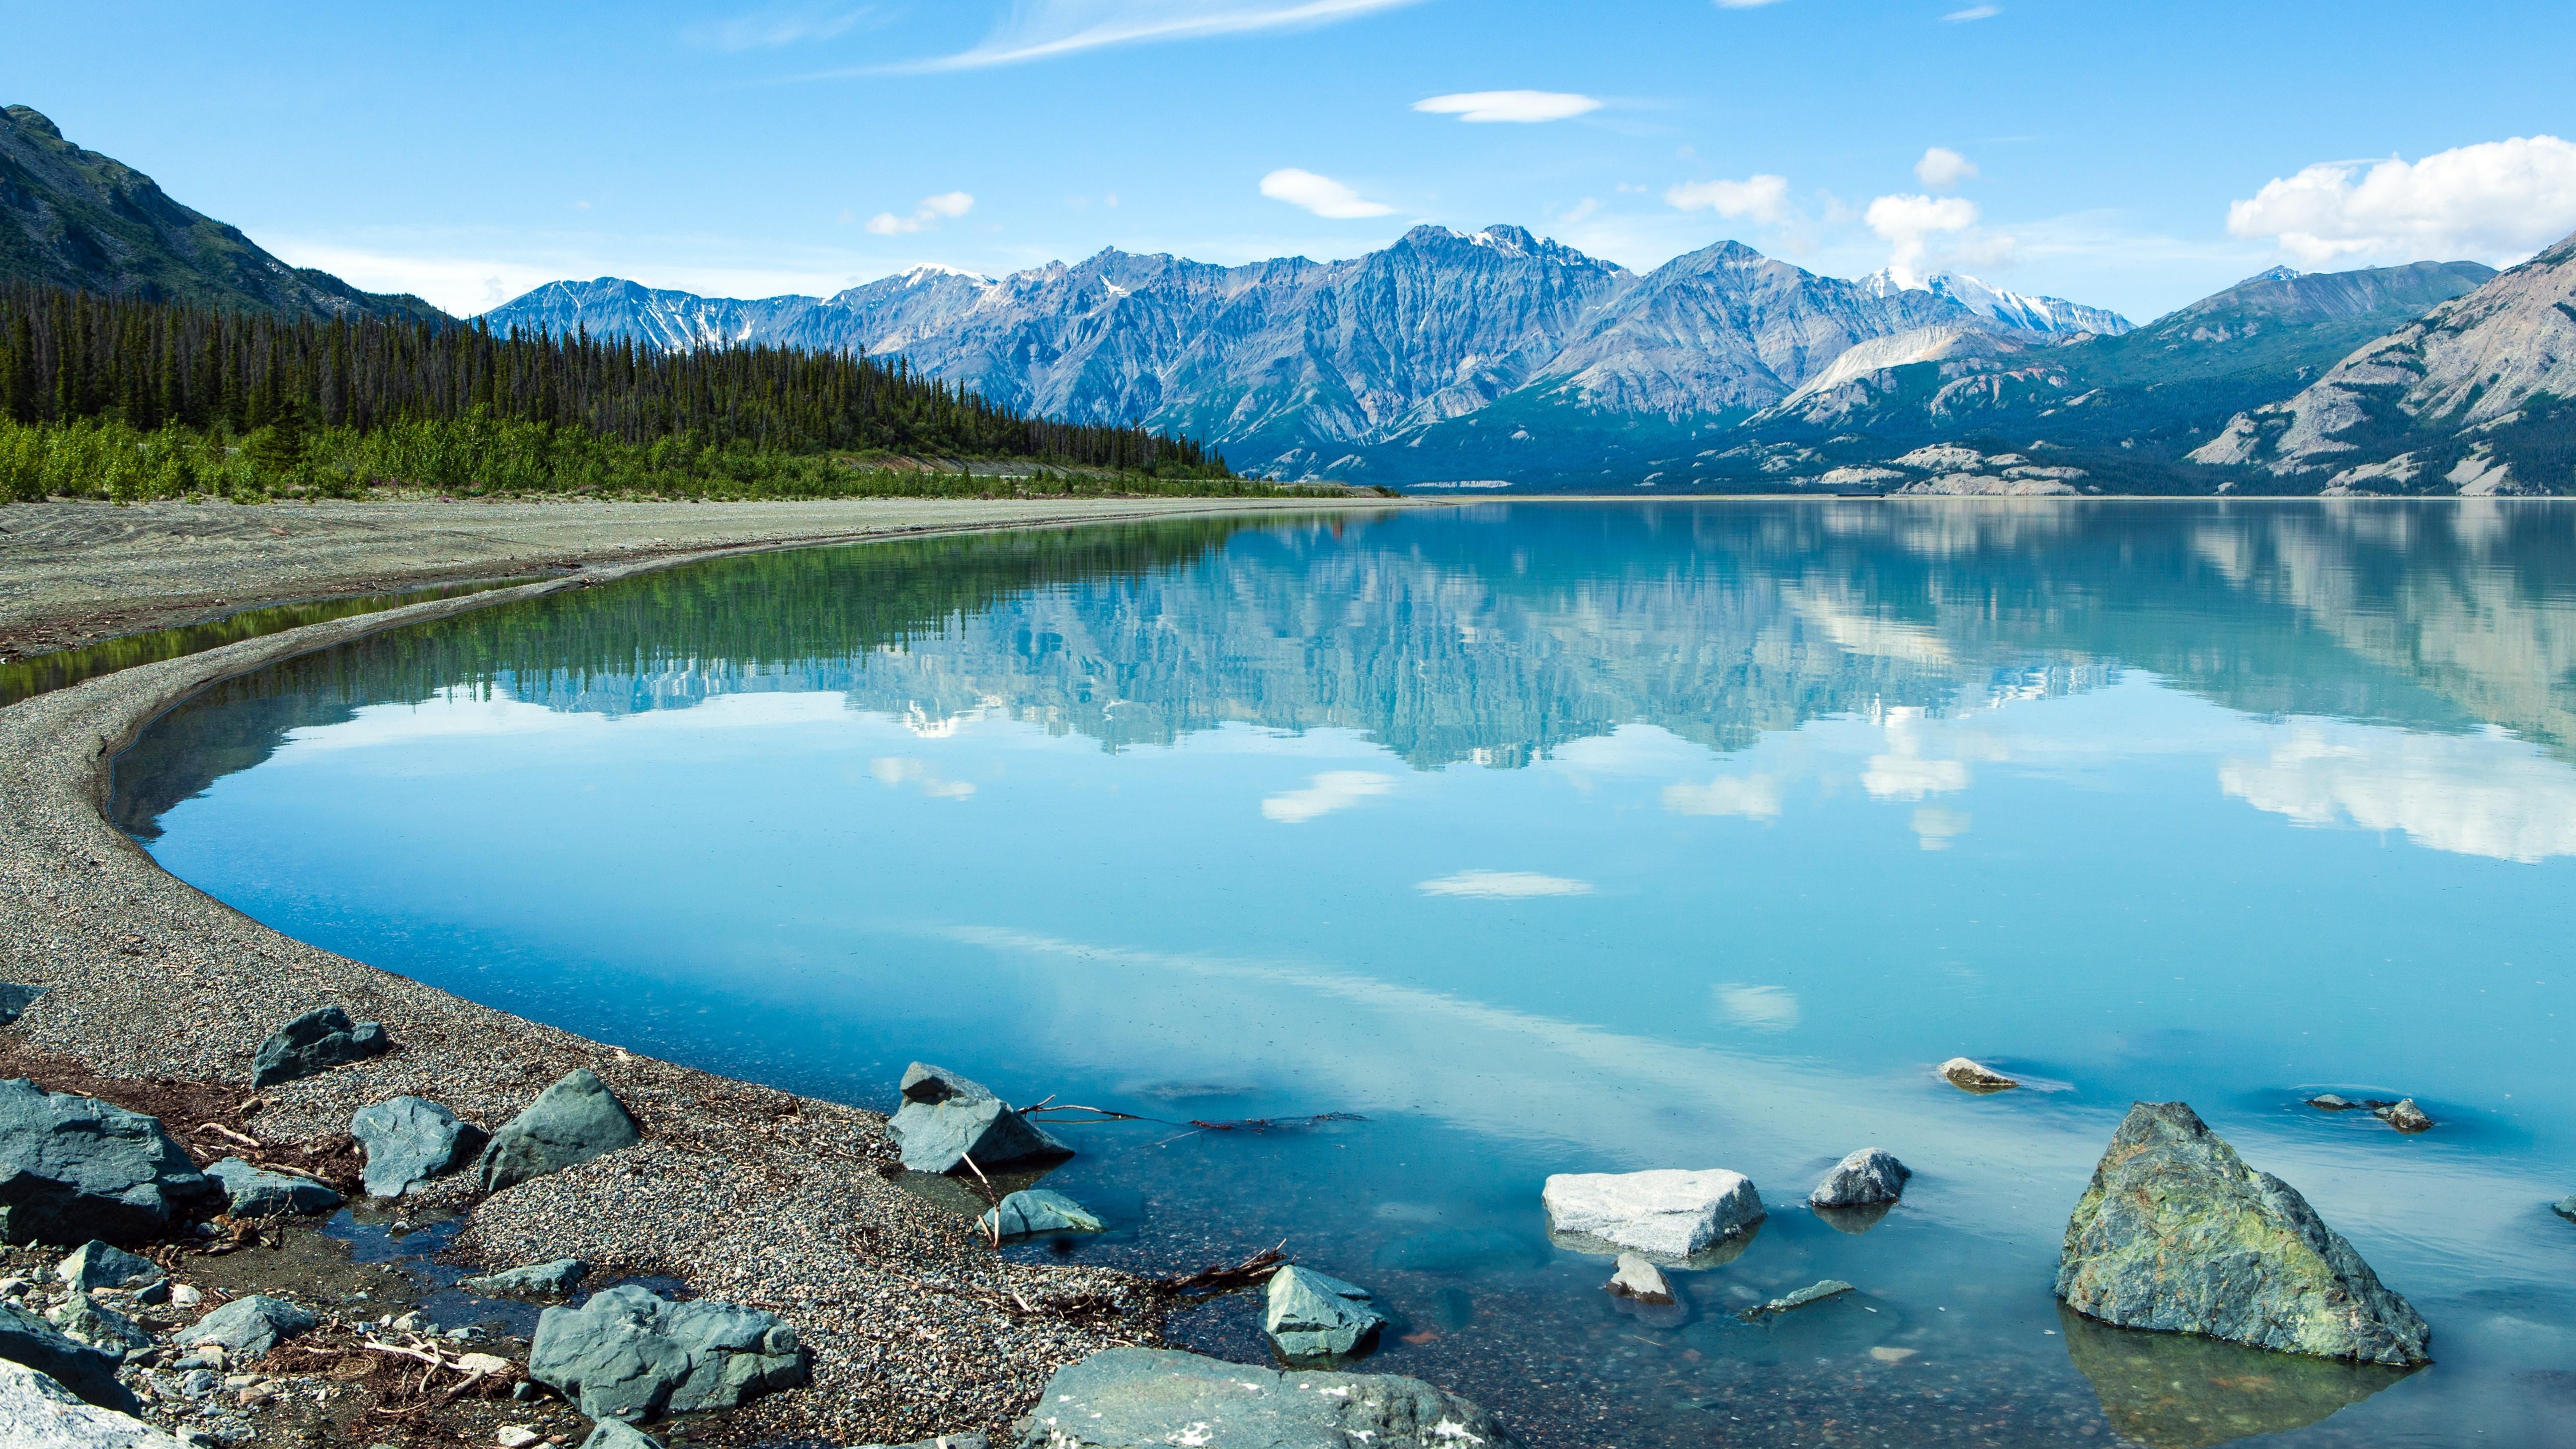 General 5120x2880 Canada Yukon landscape mountains